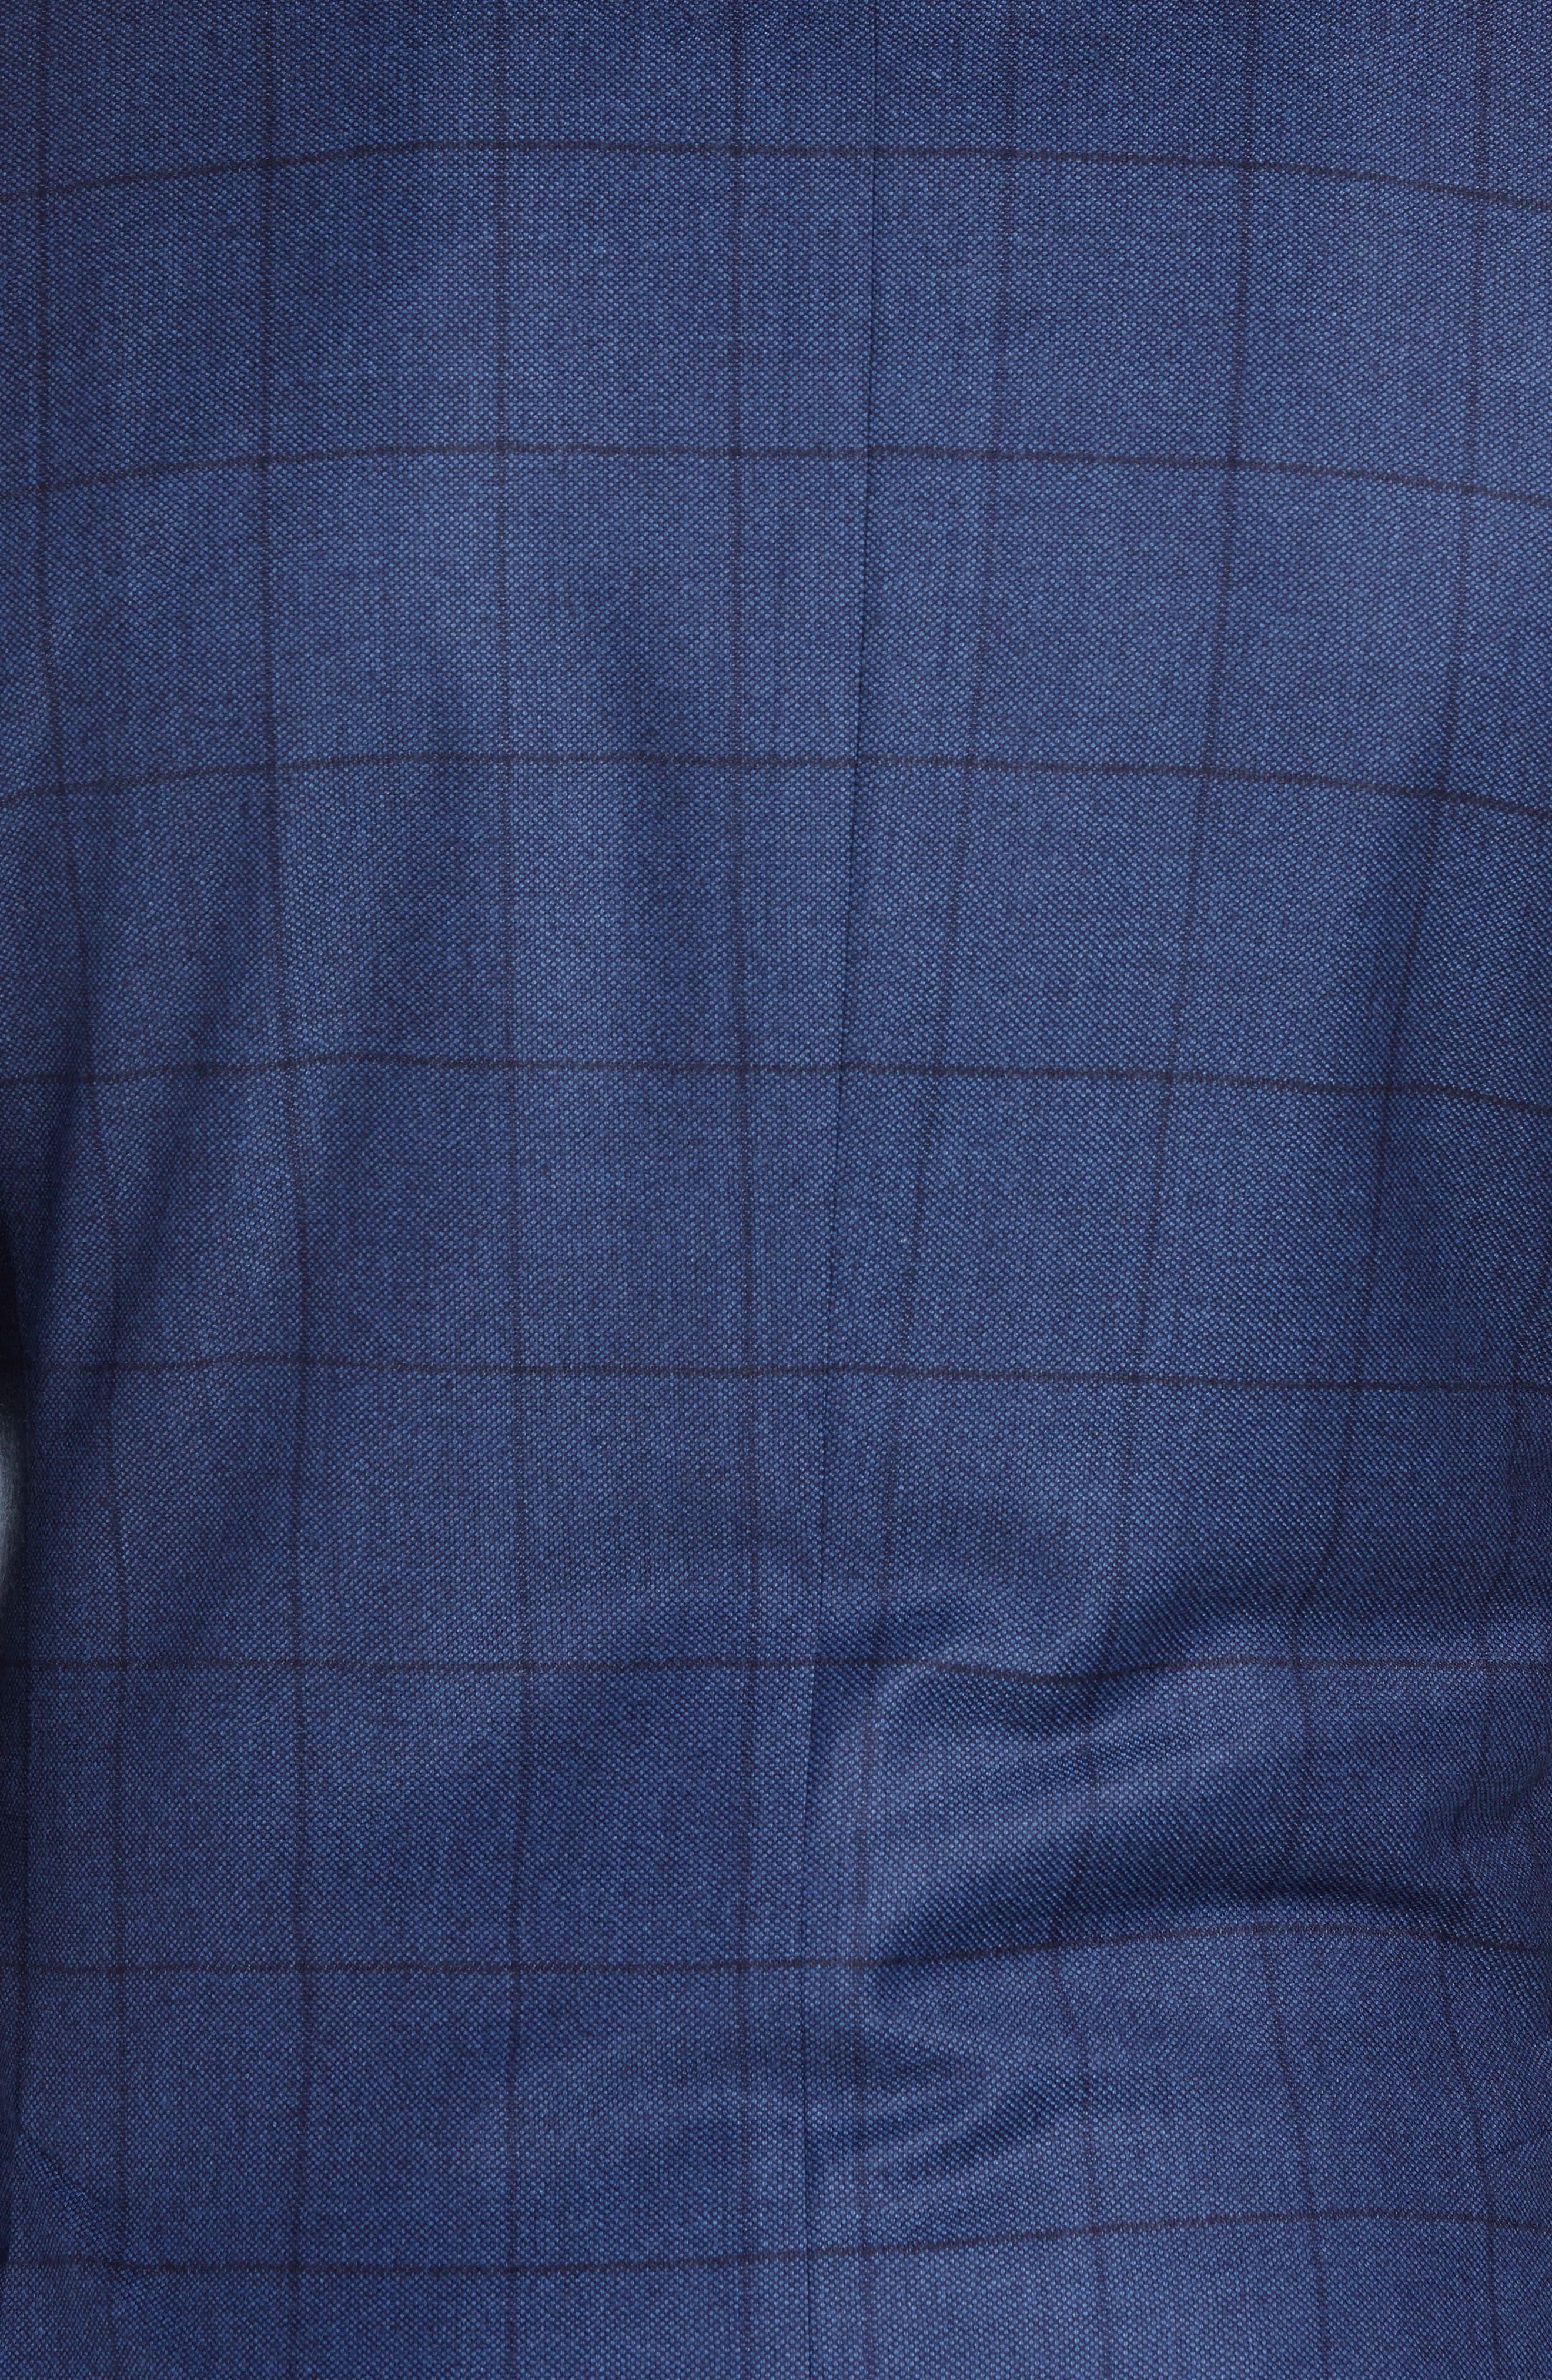 Classic Fit Windowpane Wool & Cashmere Suit,                             Alternate thumbnail 7, color,                             MEDIUM BLUE